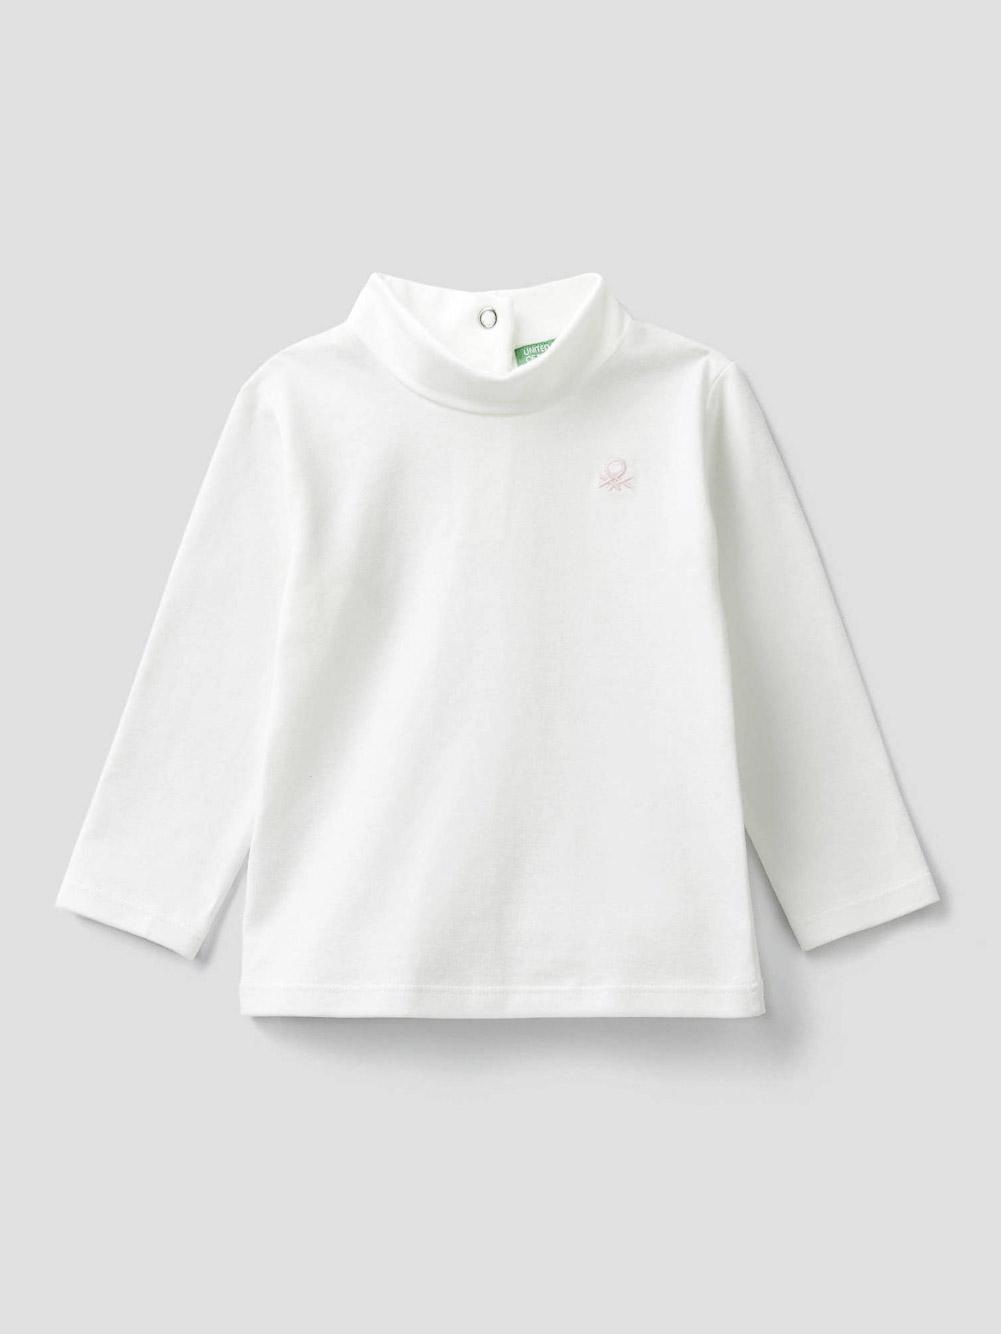 012 BENETTON T-shirt με λογότυπο και κουμπιά 3P4ZC14QV 20A074